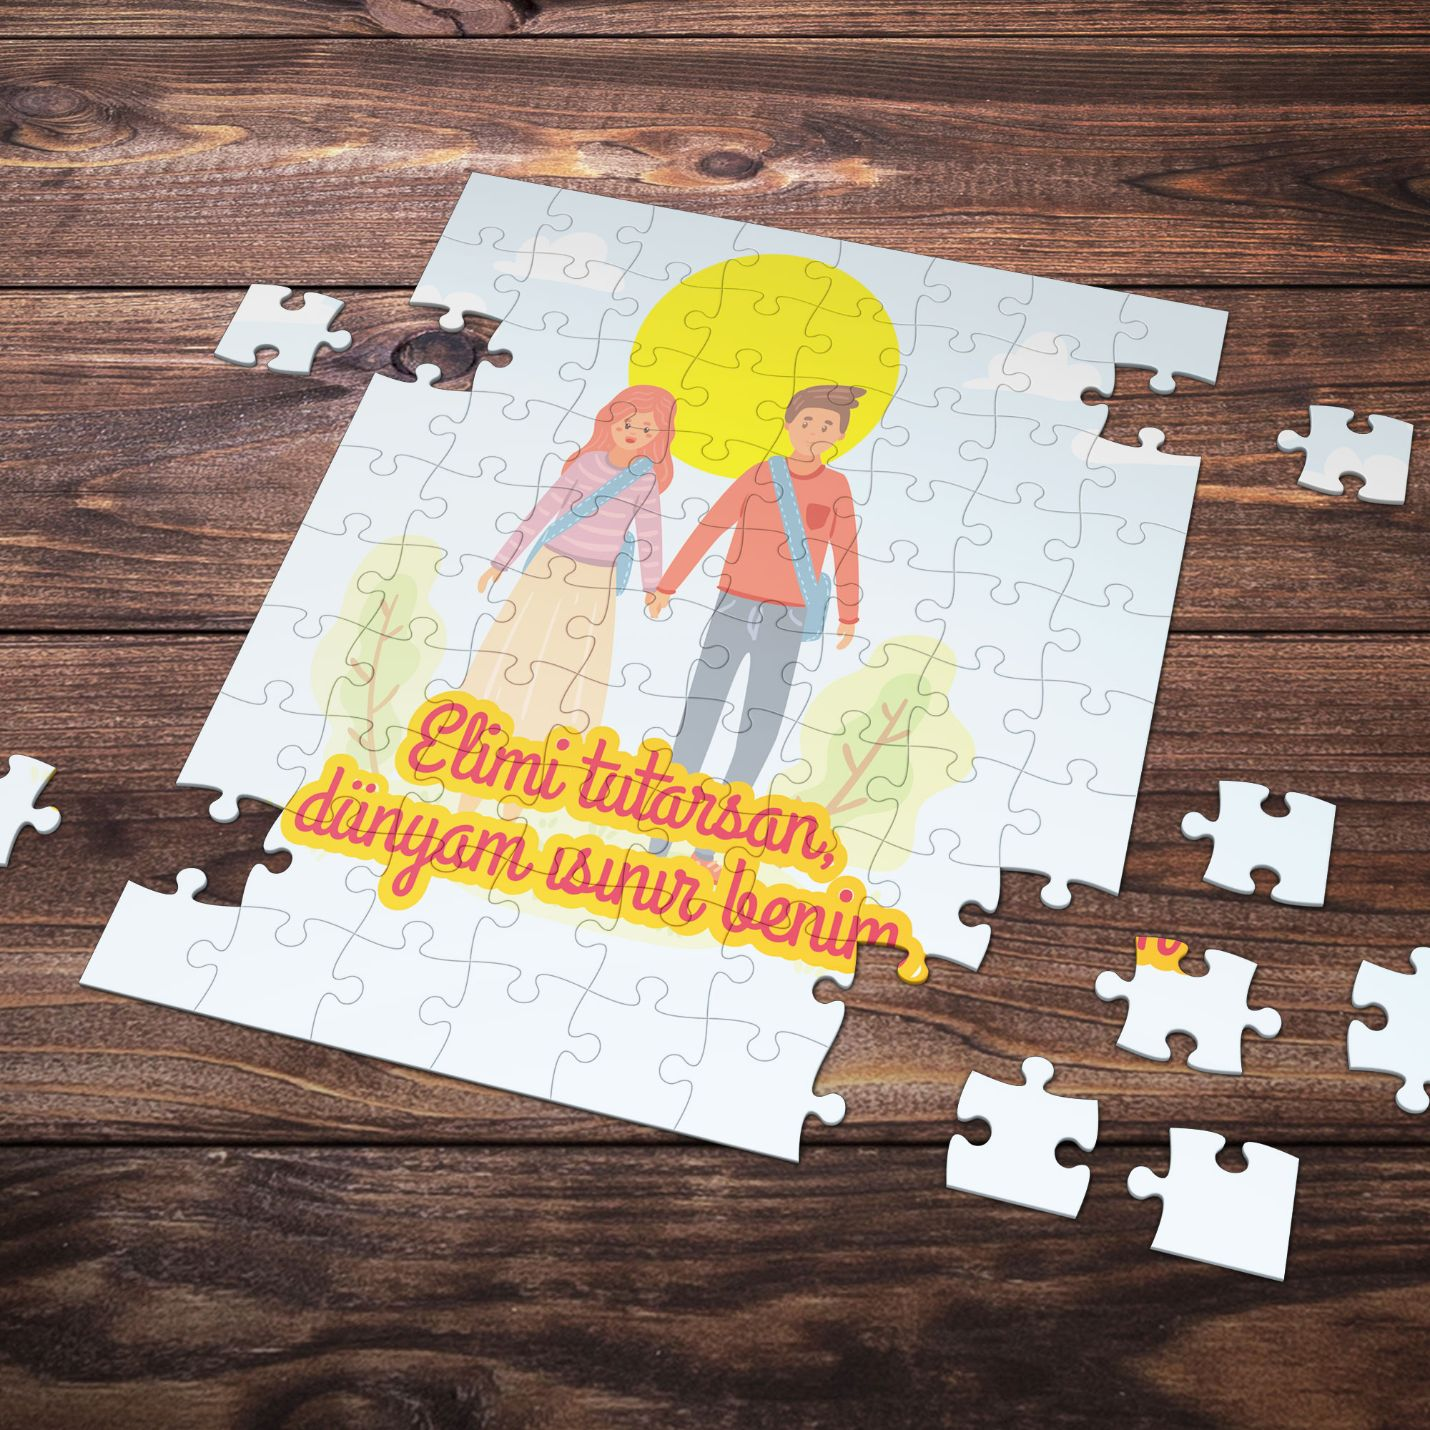 99 Parça Romantik Tasarımlı Puzzle Yapboz No16